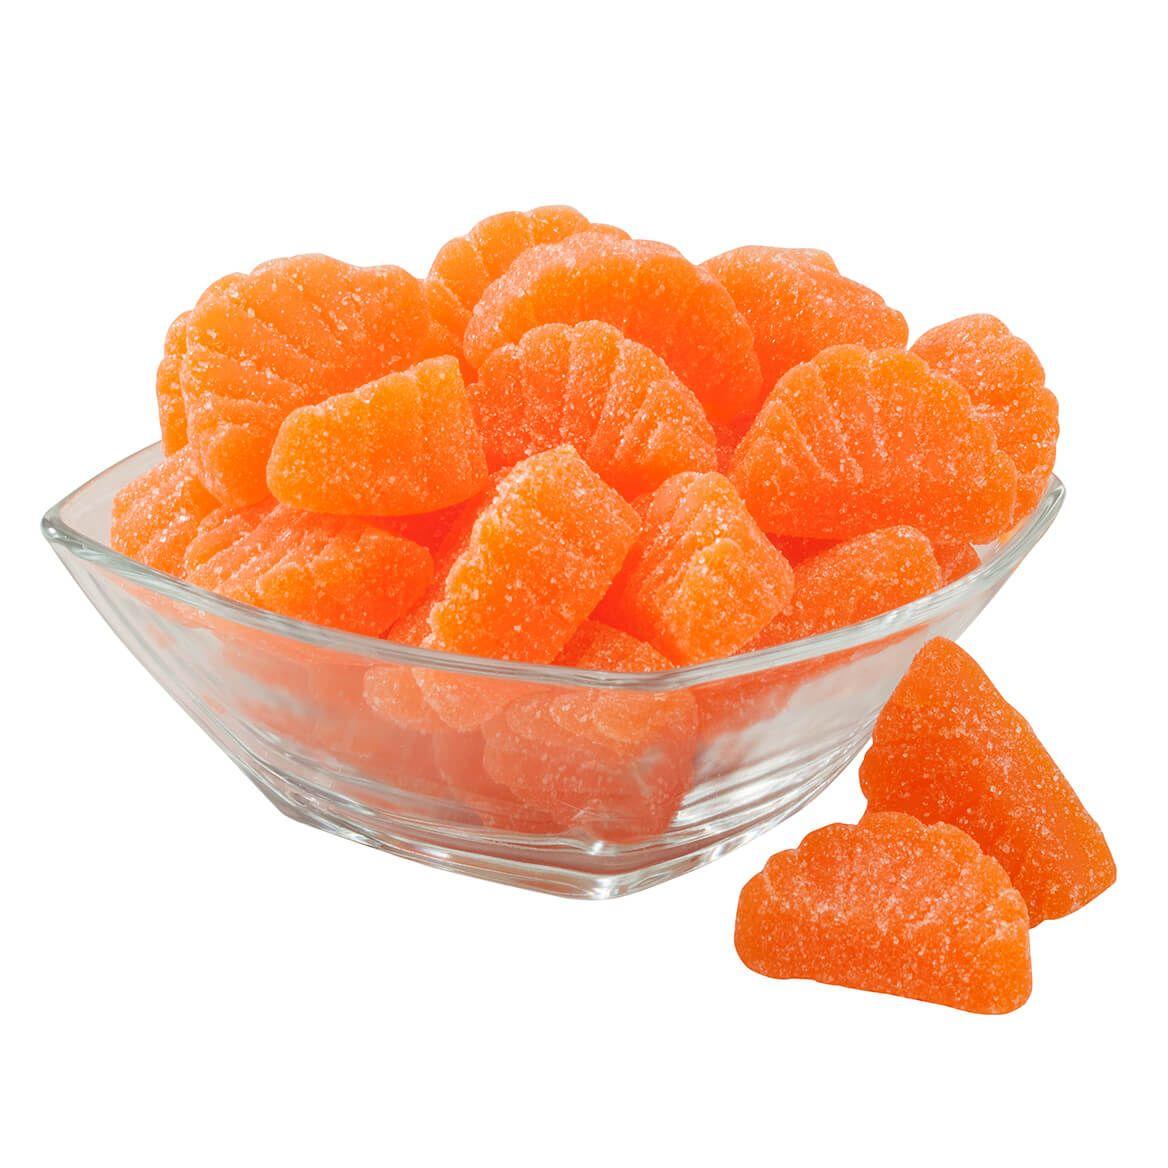 Orange Slices 24 oz.-364278